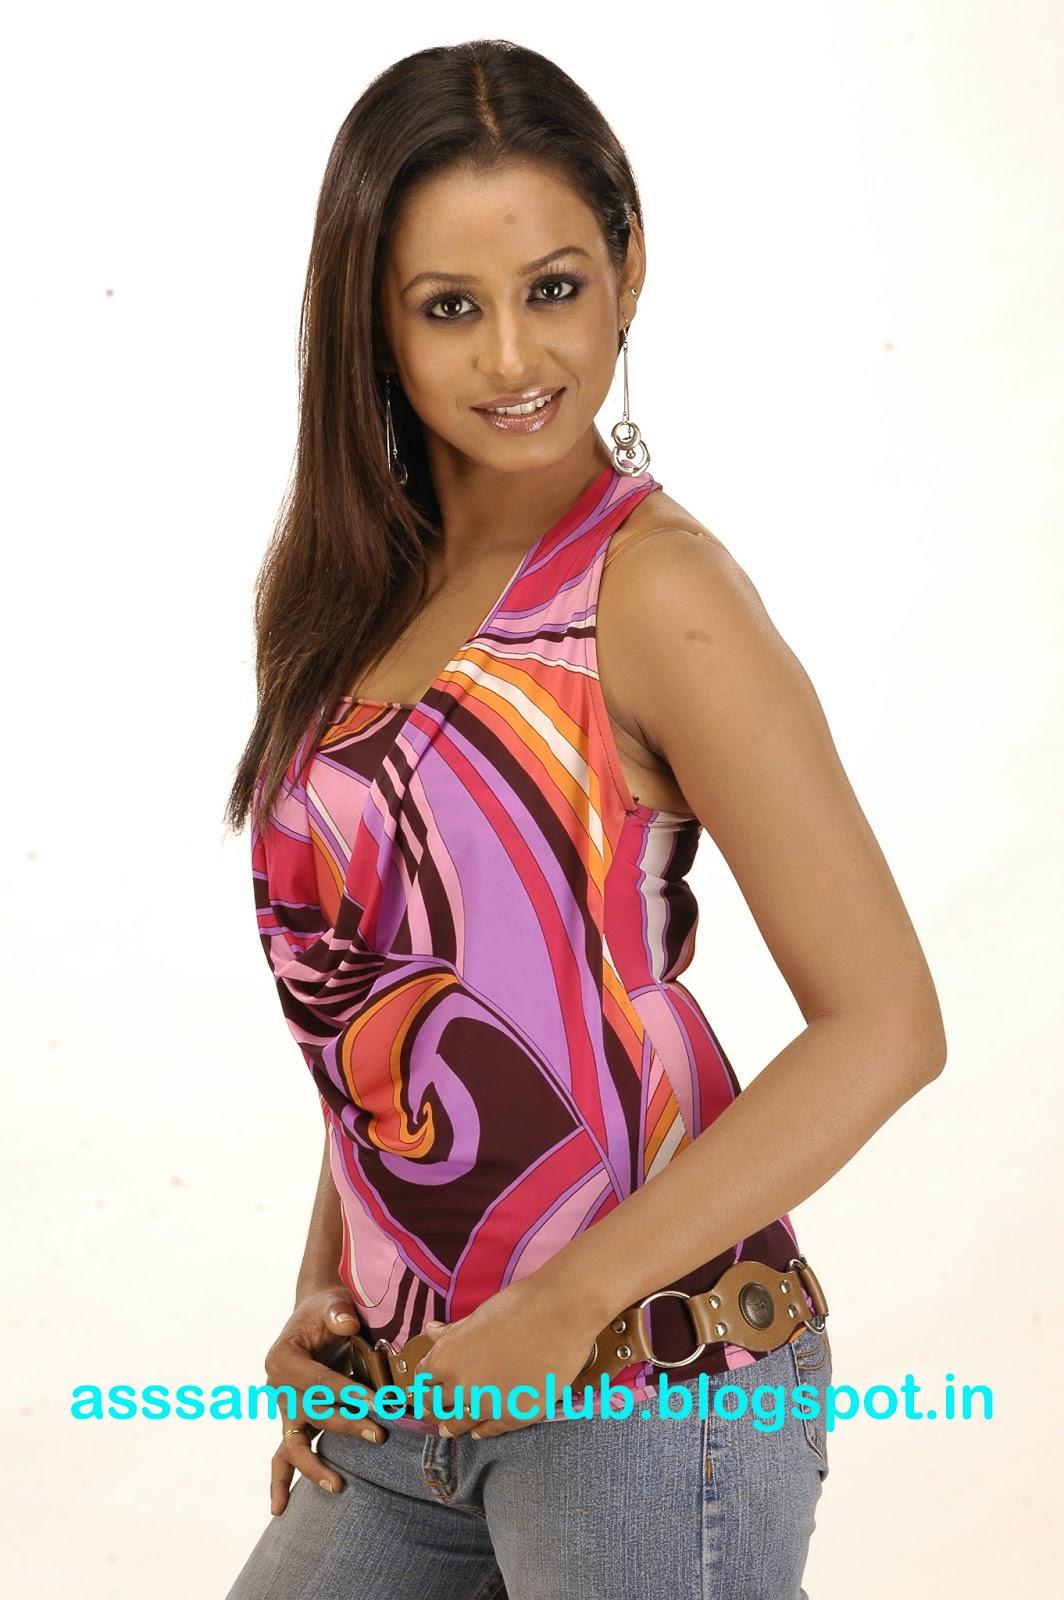 Assamese Actress Naked Photo